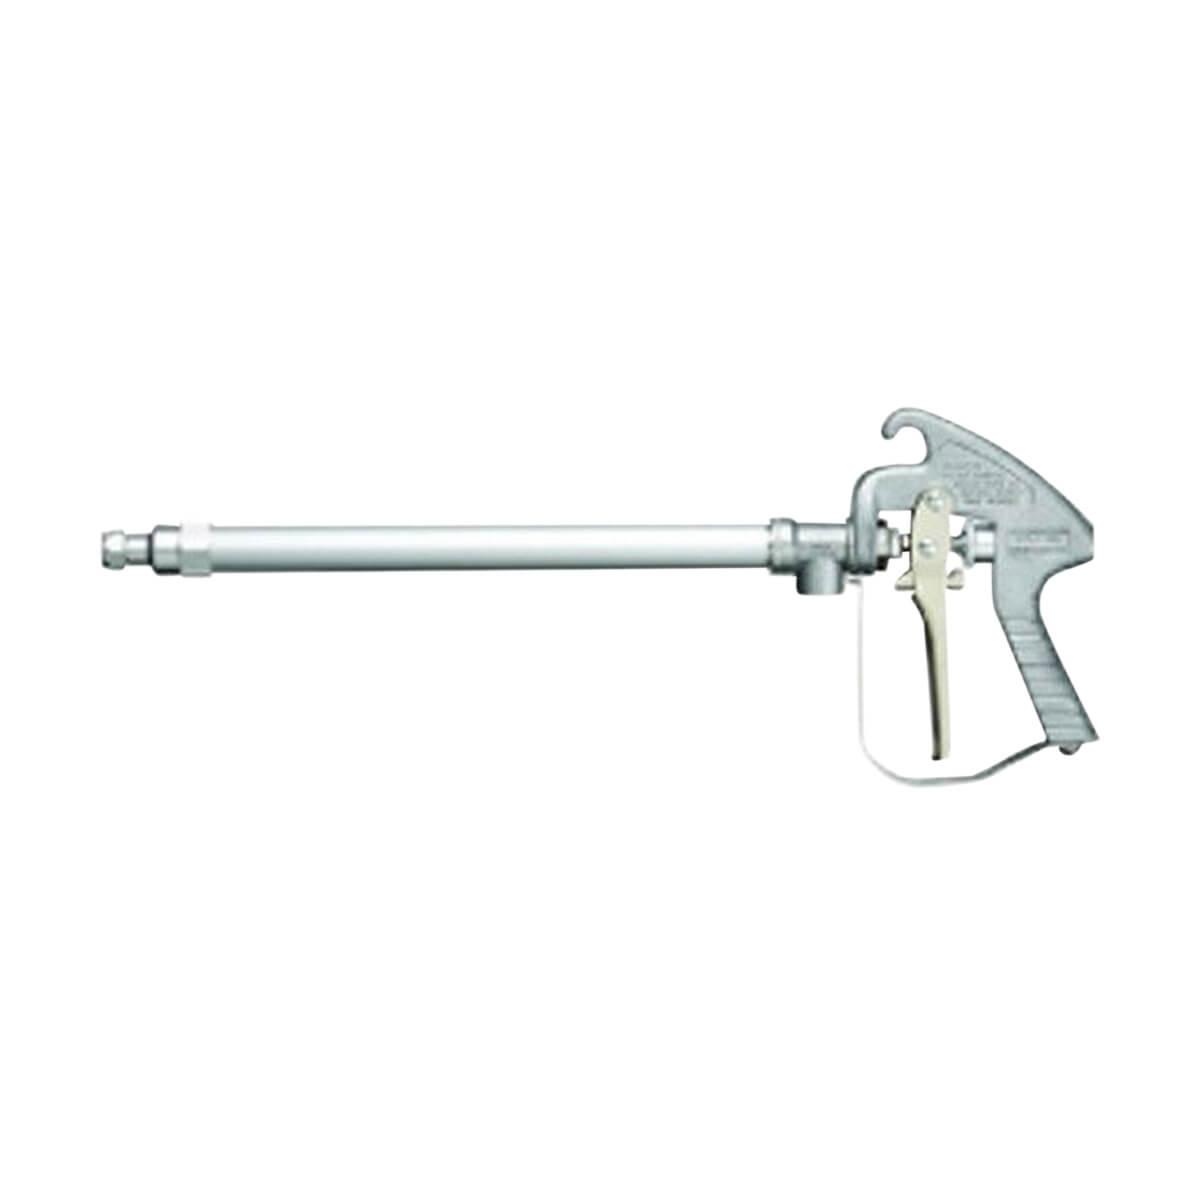 "22"" GunJet Spray Gun"